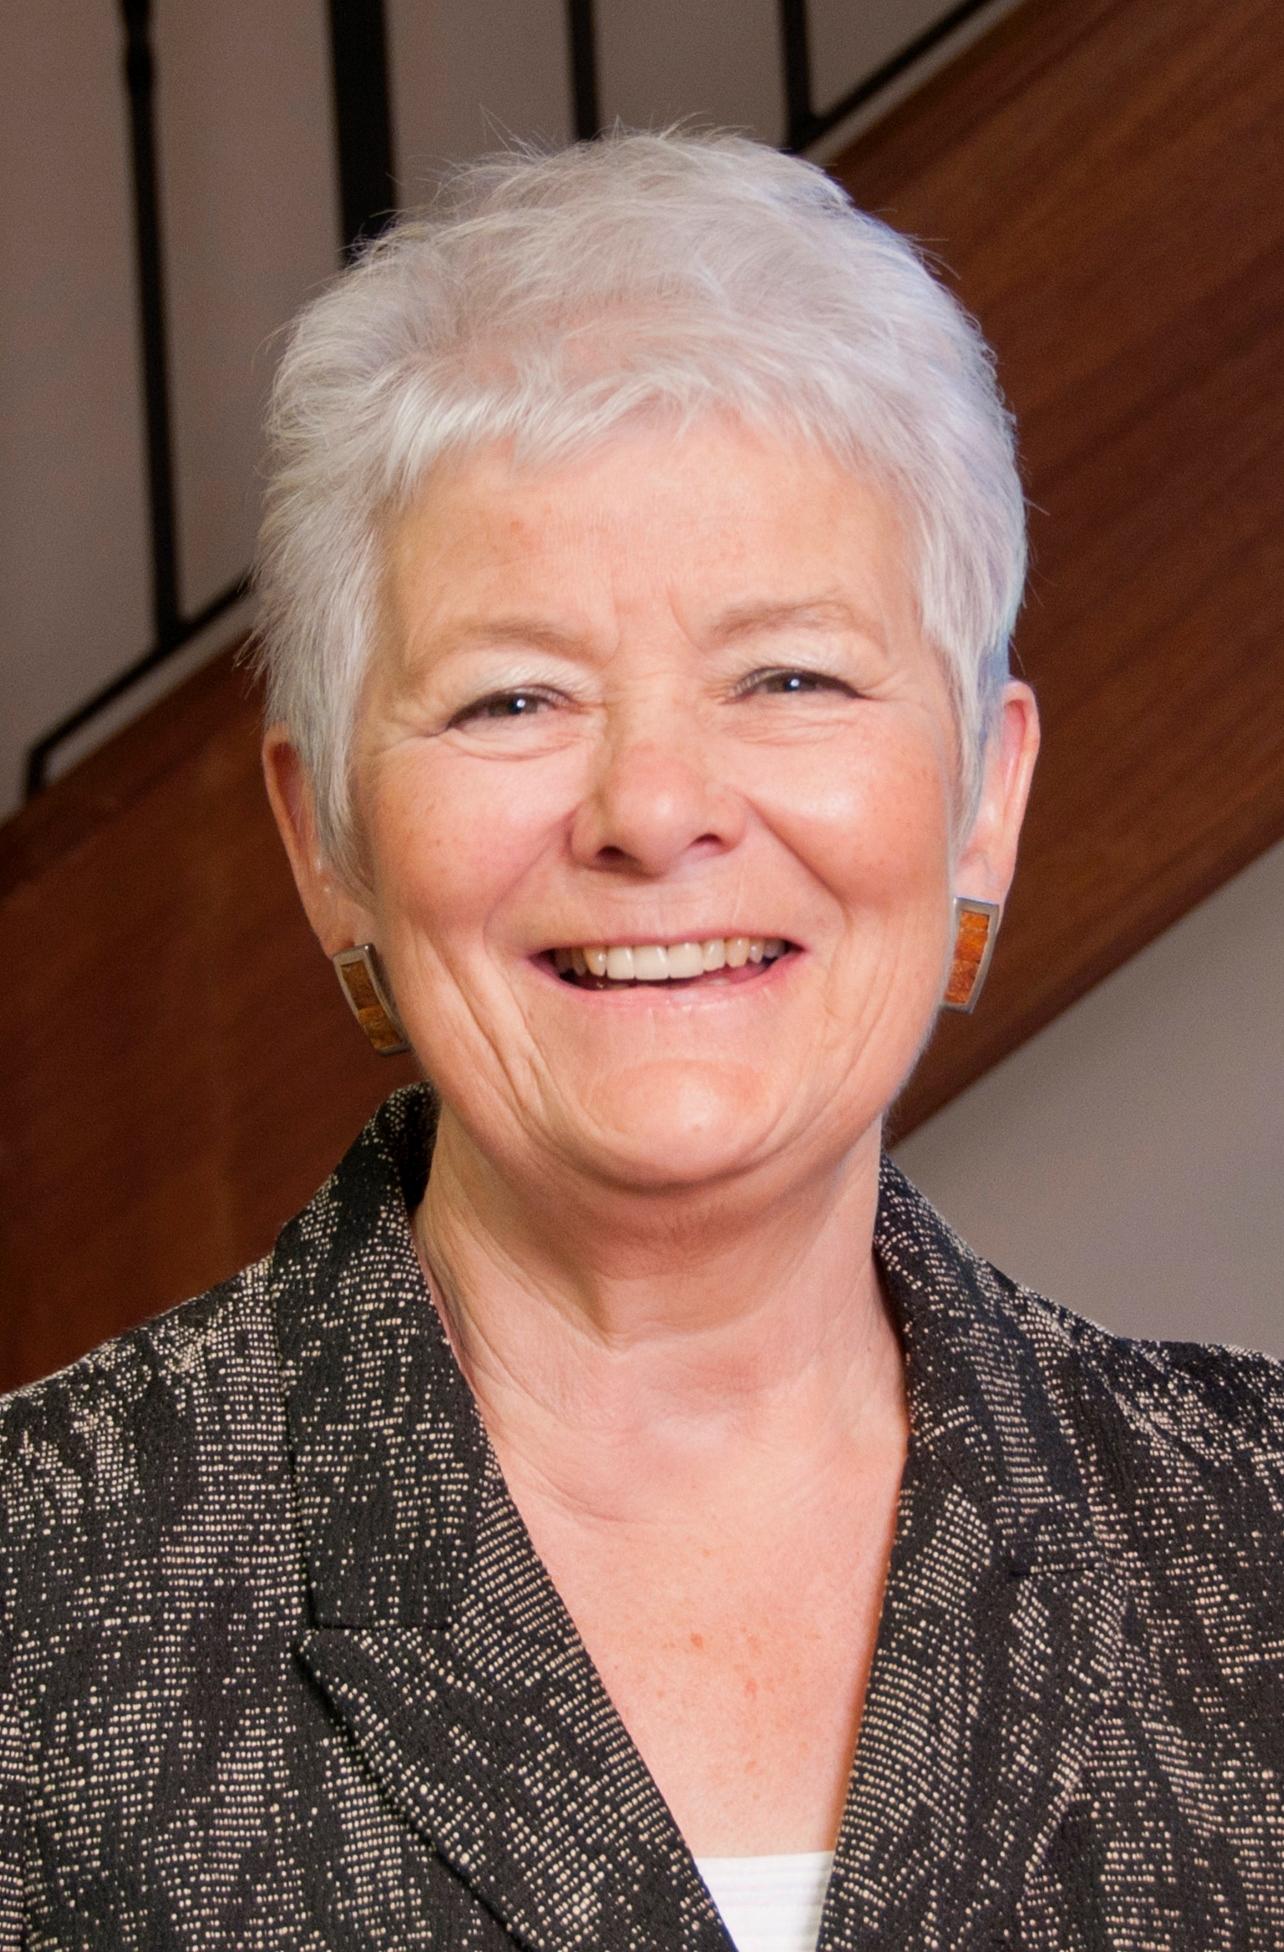 Sheila Childerhouse, West Suffolk NHS Foundation Trust's new chair